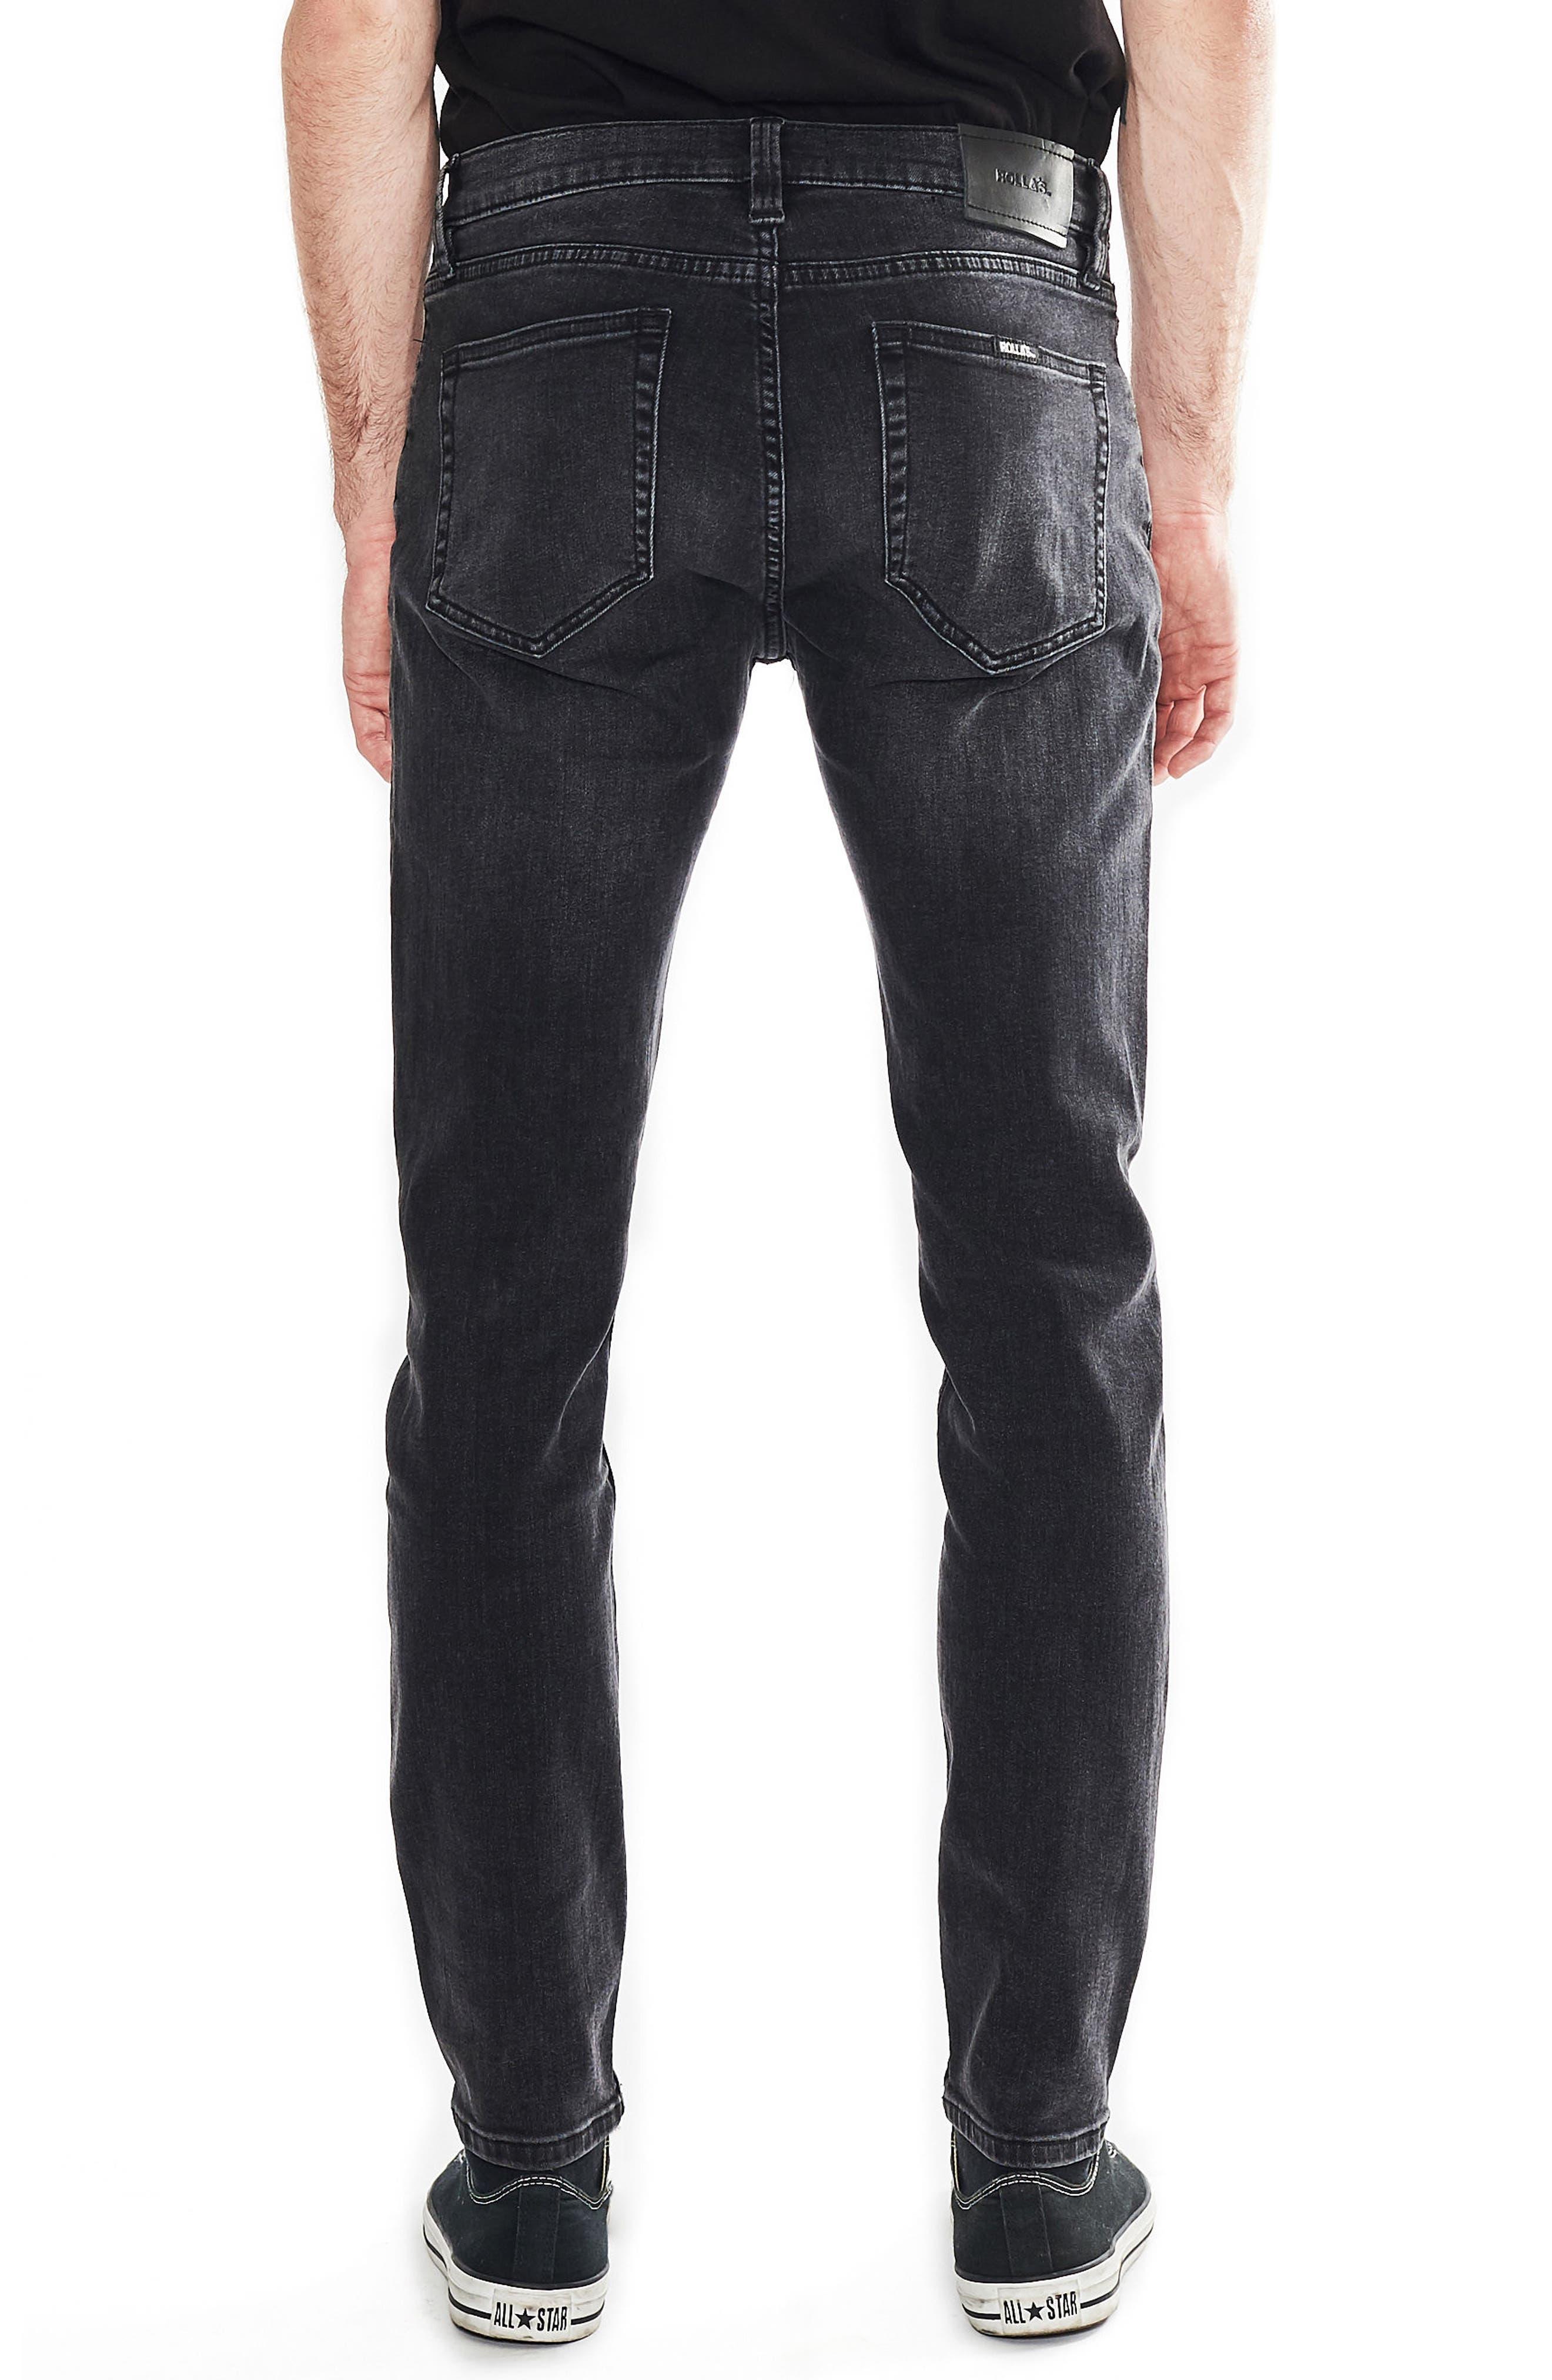 Stinger Skinny Fit Jeans,                             Alternate thumbnail 2, color,                             Black Hole